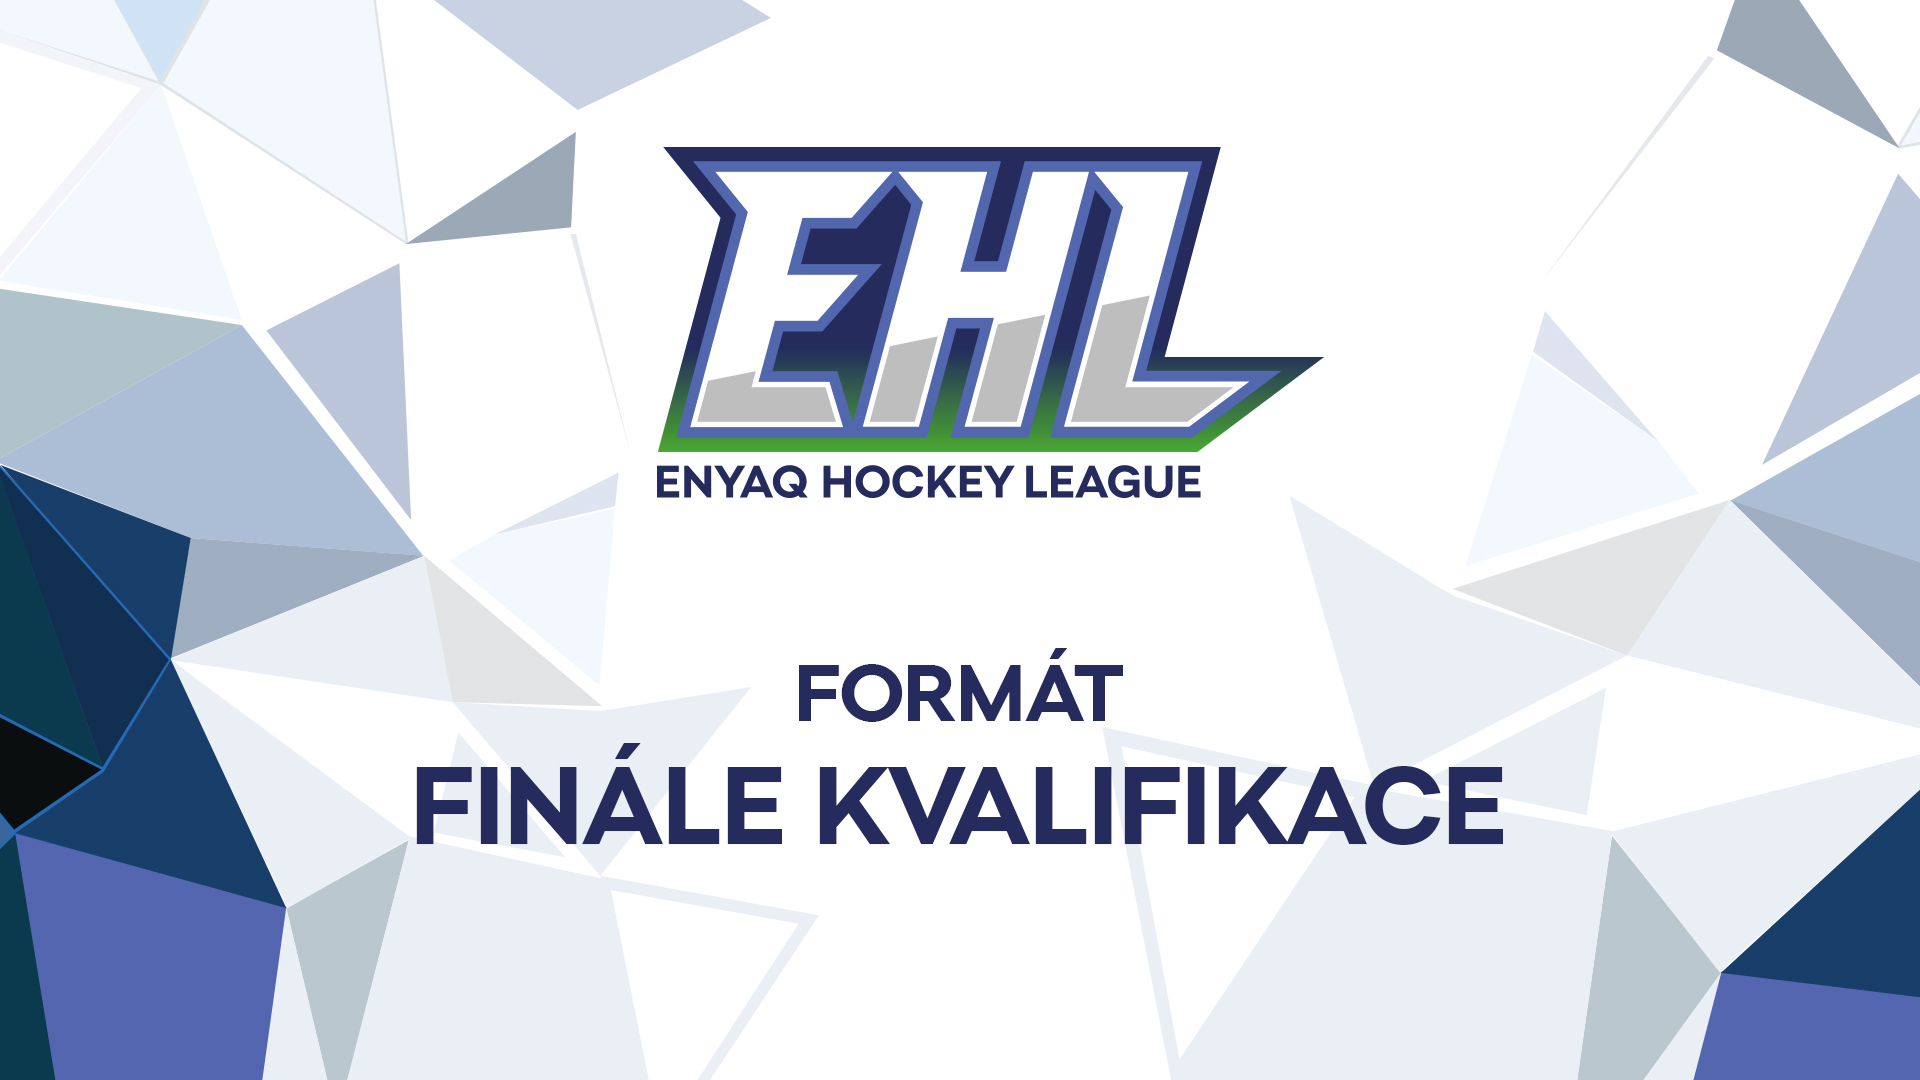 format-finale-kvalifikace